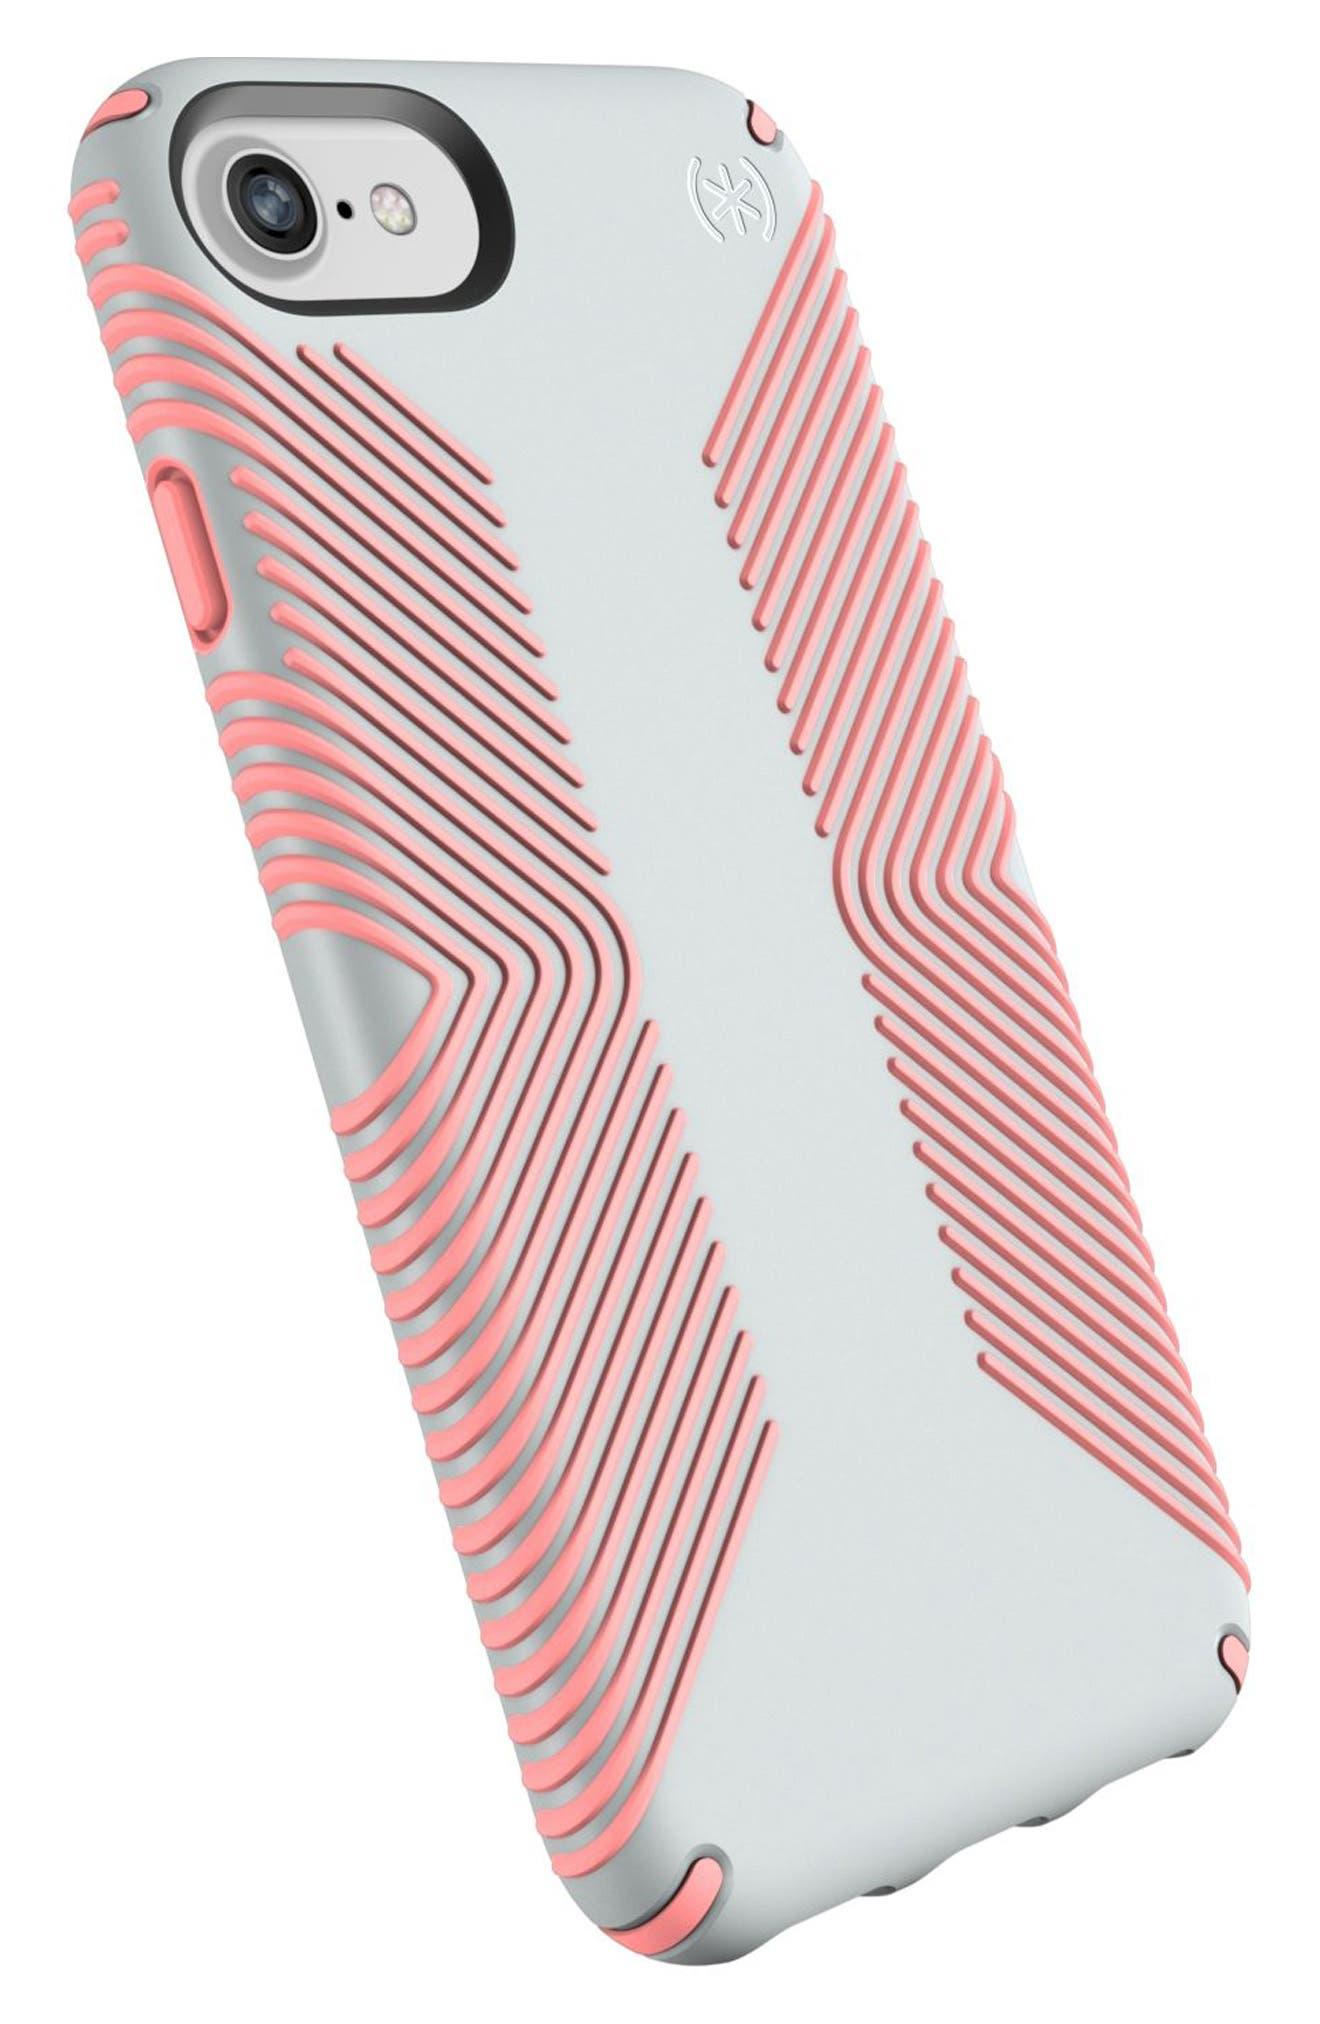 Grip iPhone 6/6s/7/8 Case,                             Alternate thumbnail 8, color,                             020